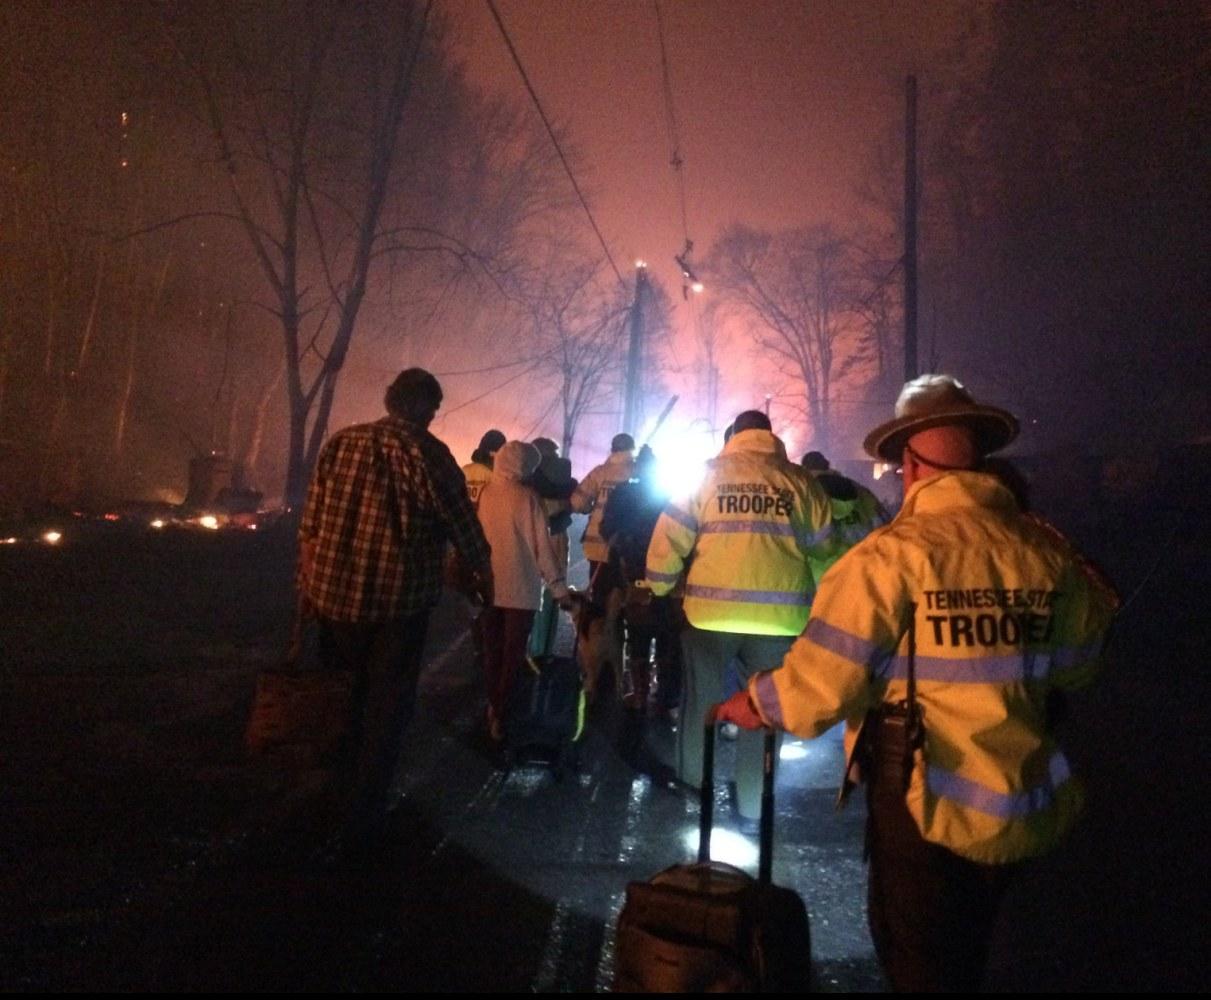 The city of Gatlinburg, Tennessee is under evacuation